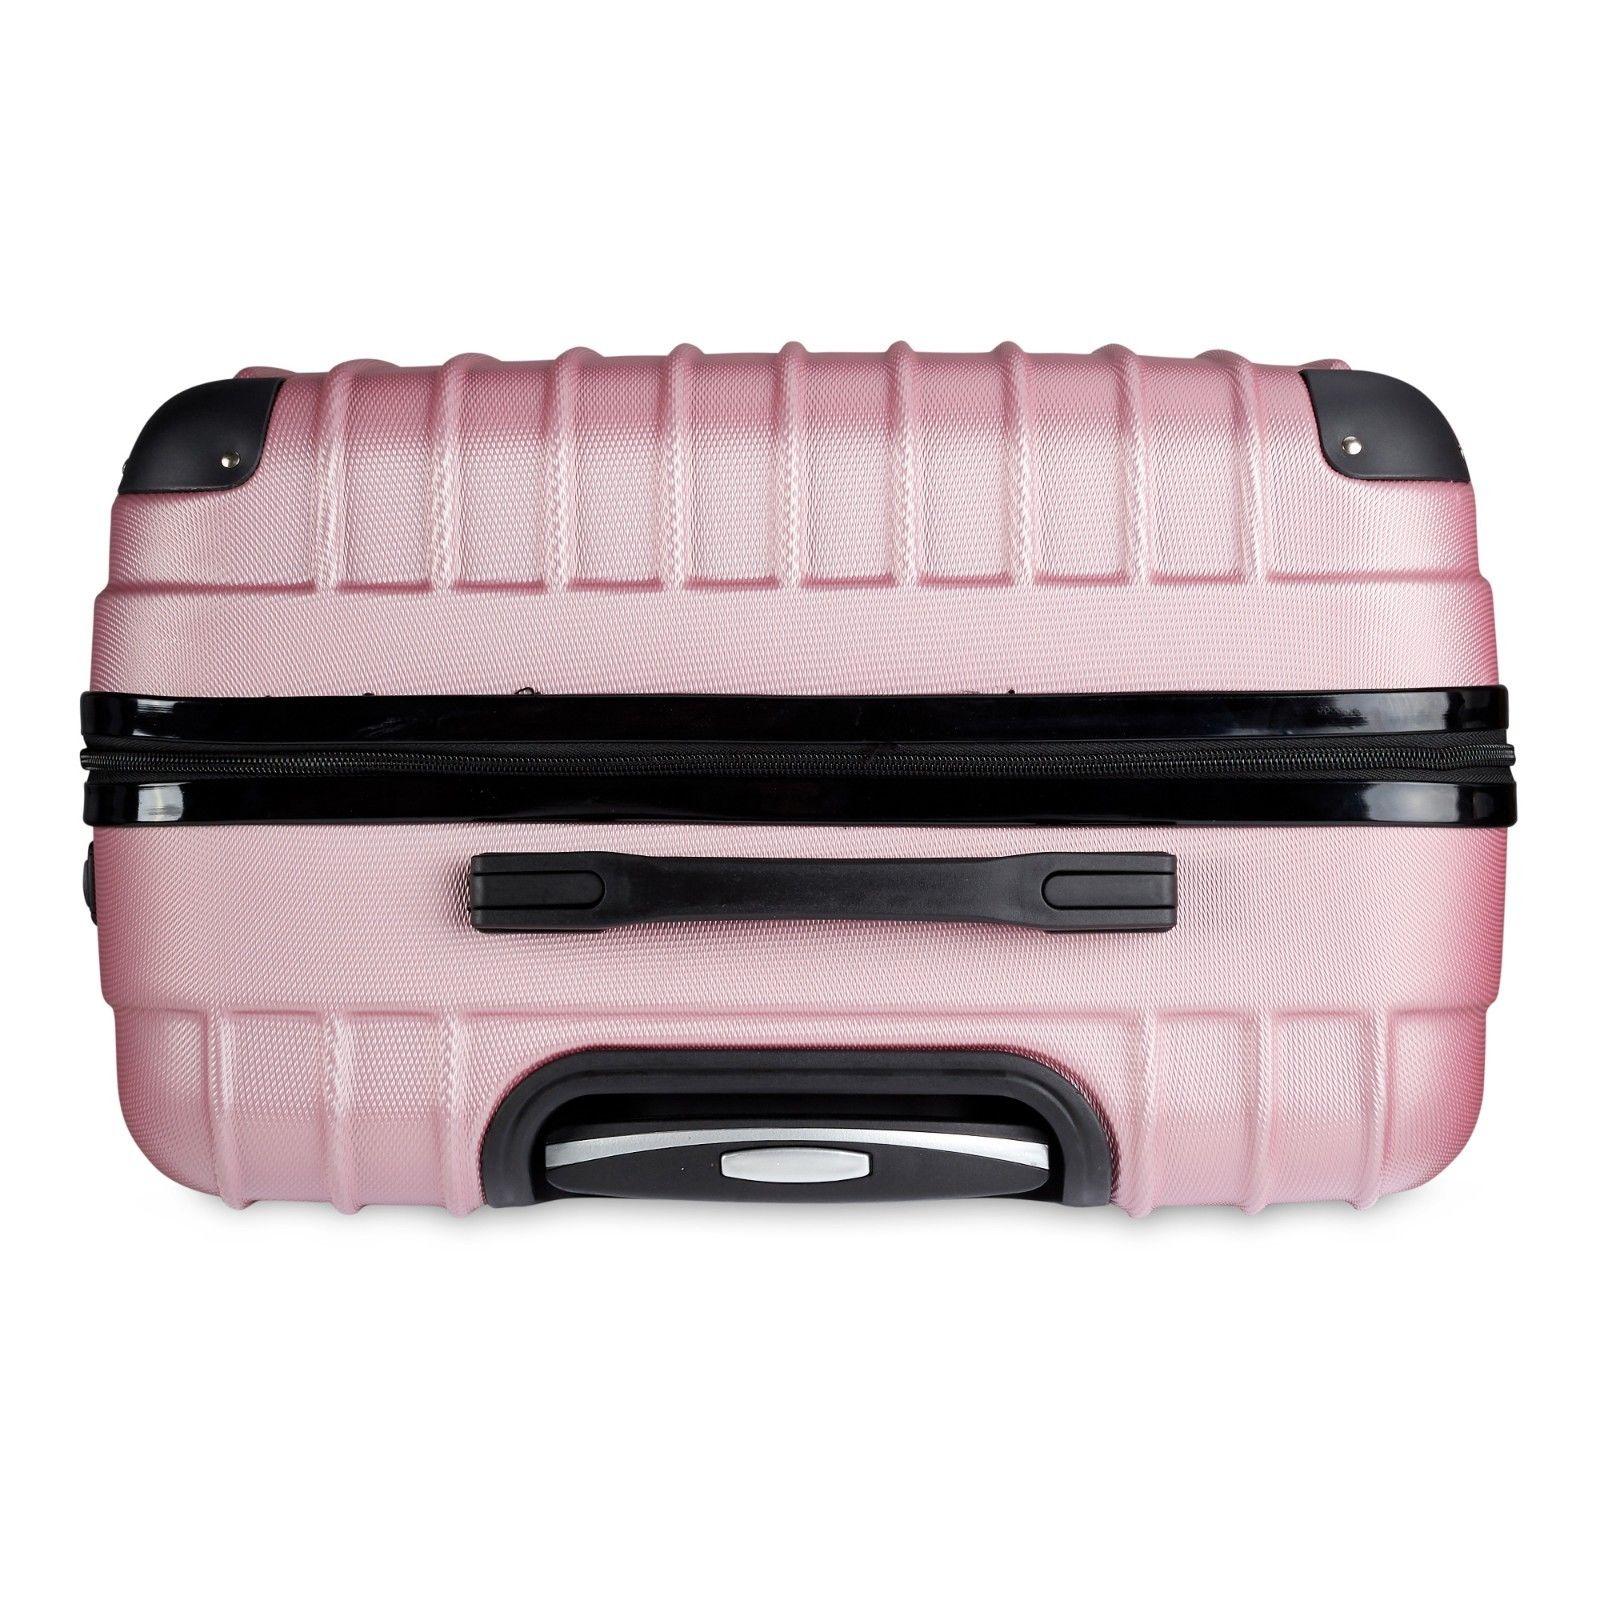 Milano-Premium-3pc-ABS-Luggage-Suitcase-Luxury-Hard-Case-Shockproof-Travel-Set thumbnail 25